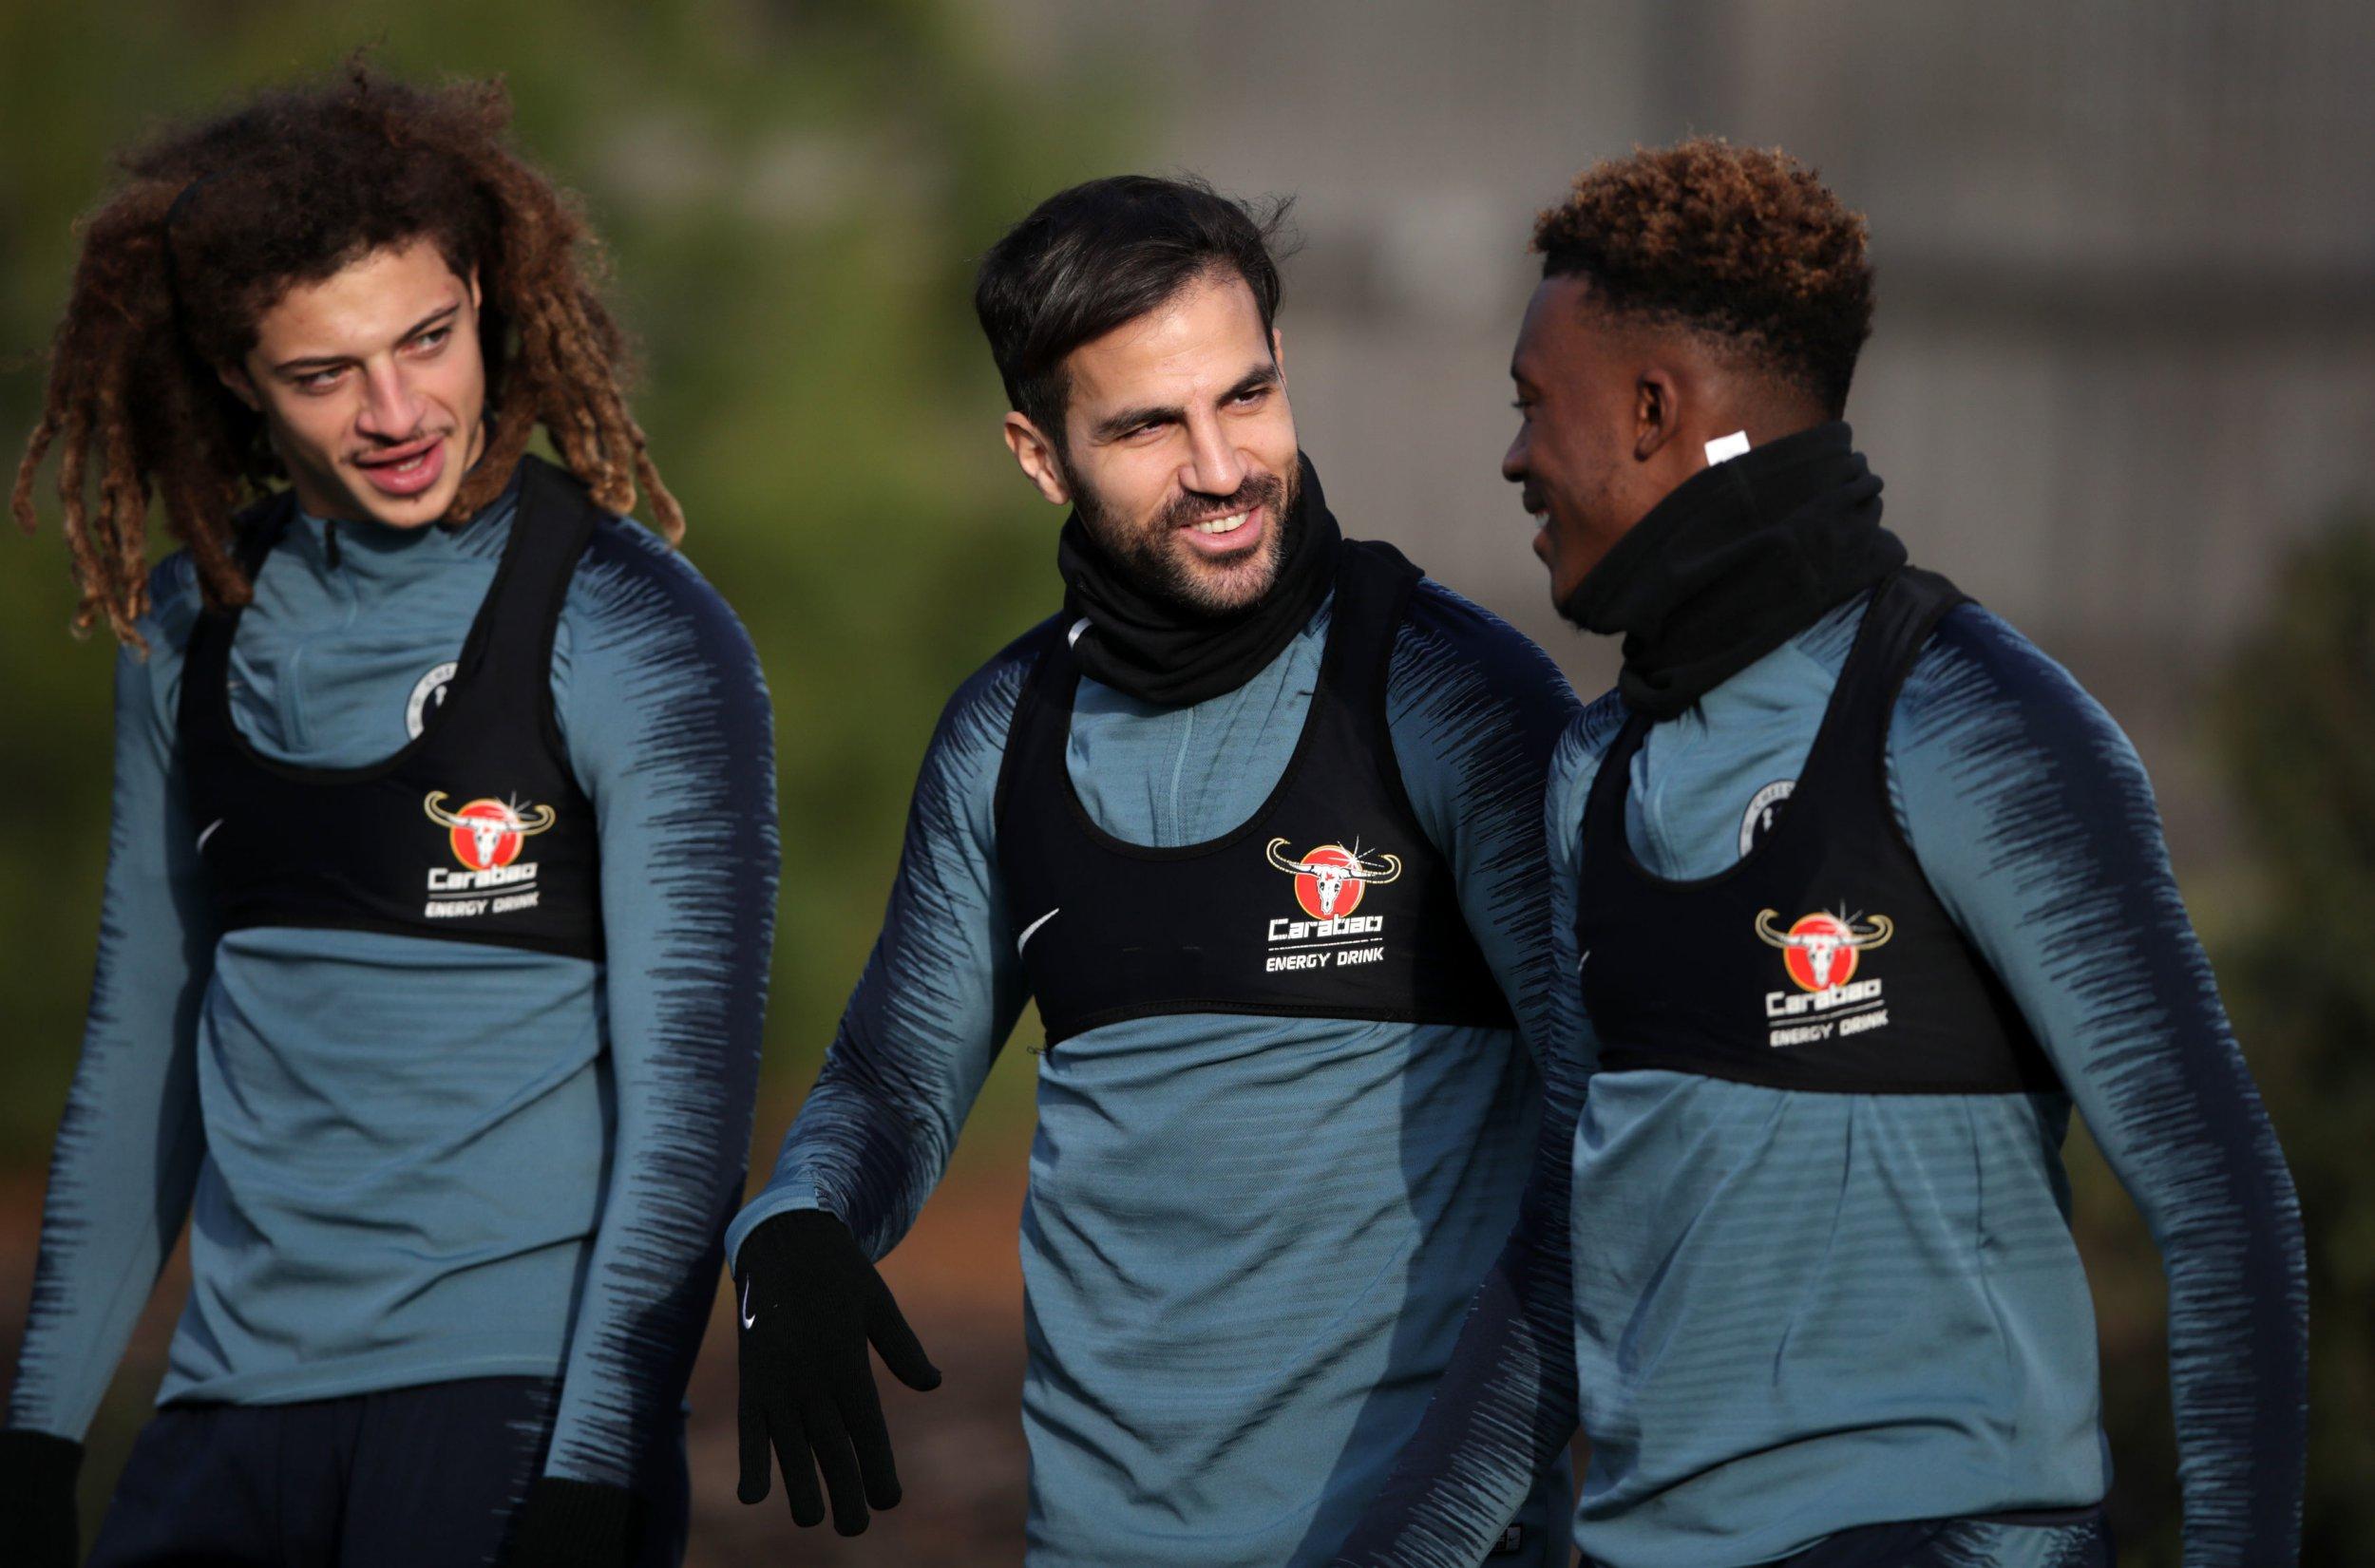 Cesc Fabregas sends message to Chelsea over Callum Hudson-Odoi before leaving for Monaco